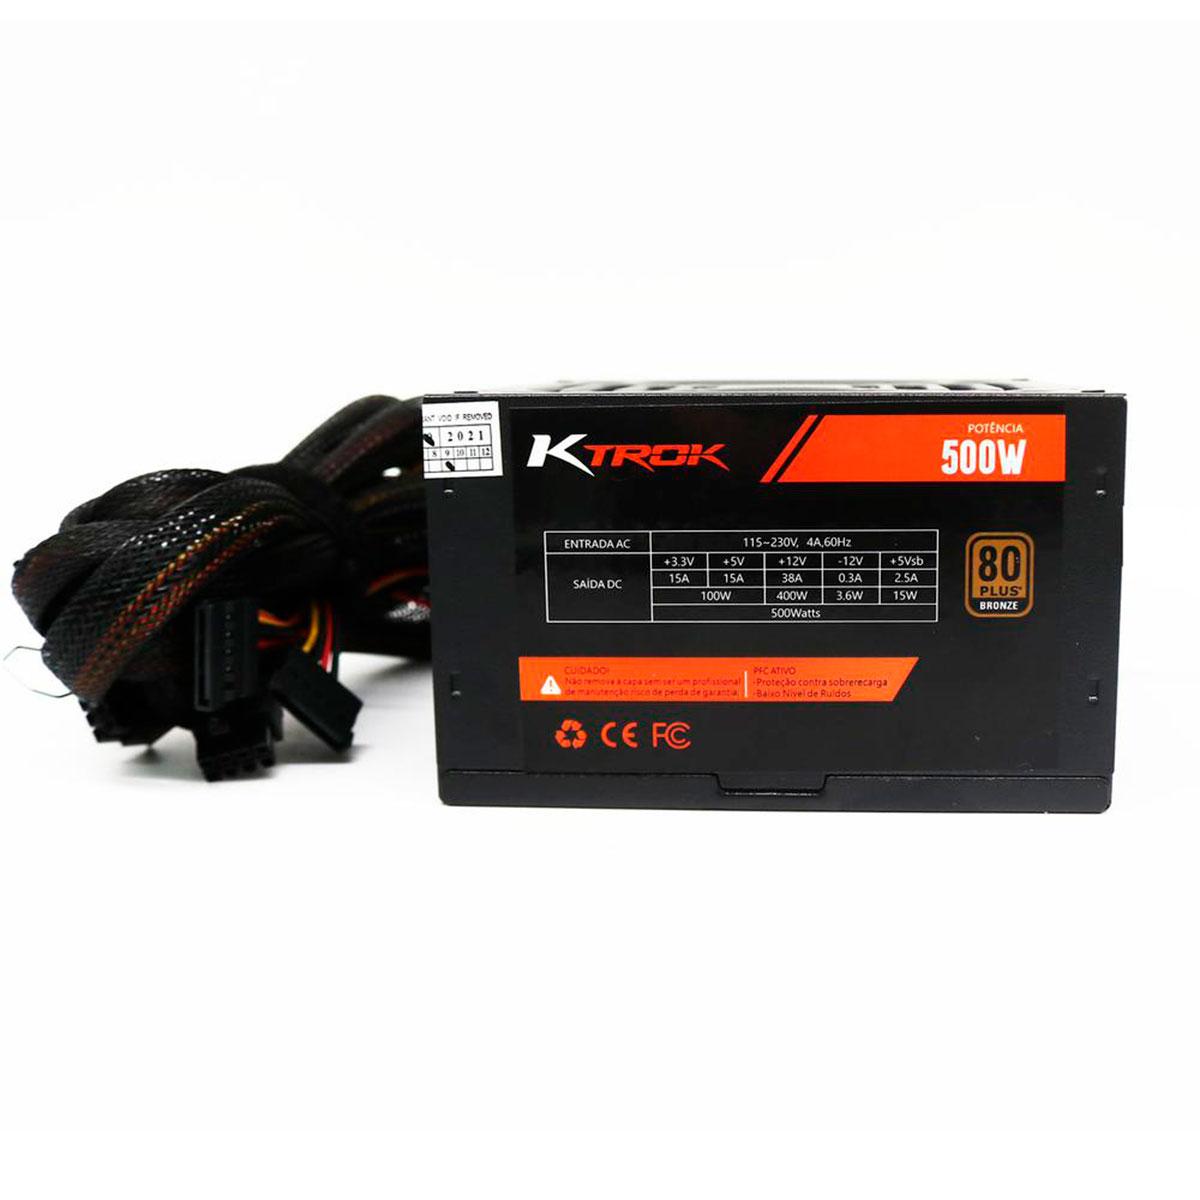 Fonte Gamer KTROK KT-FT-RGB, 500W 80 Plus Bronze, PFC Ativo, RGB, Bivolt Automático